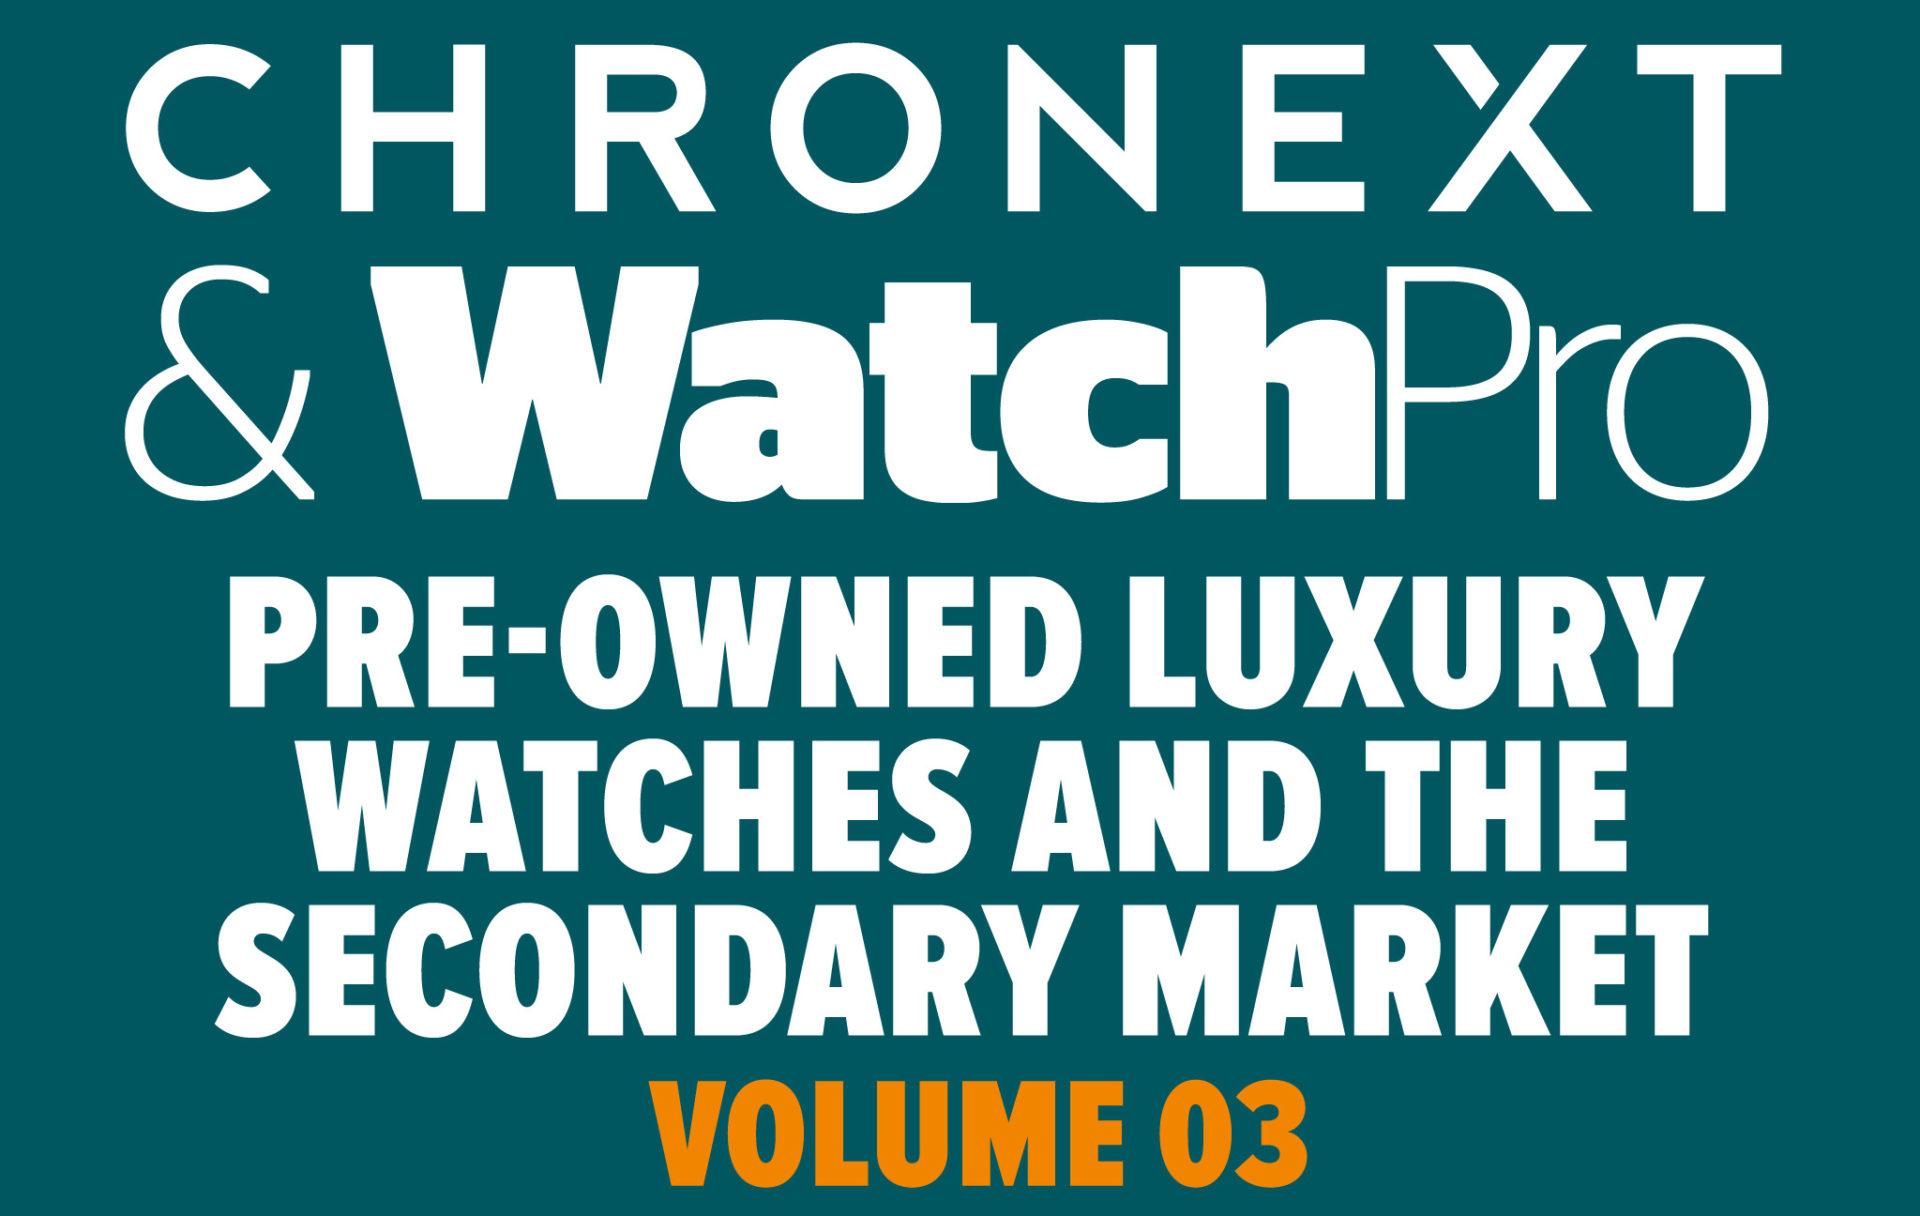 CHRONEXT SPECIAL REPORT